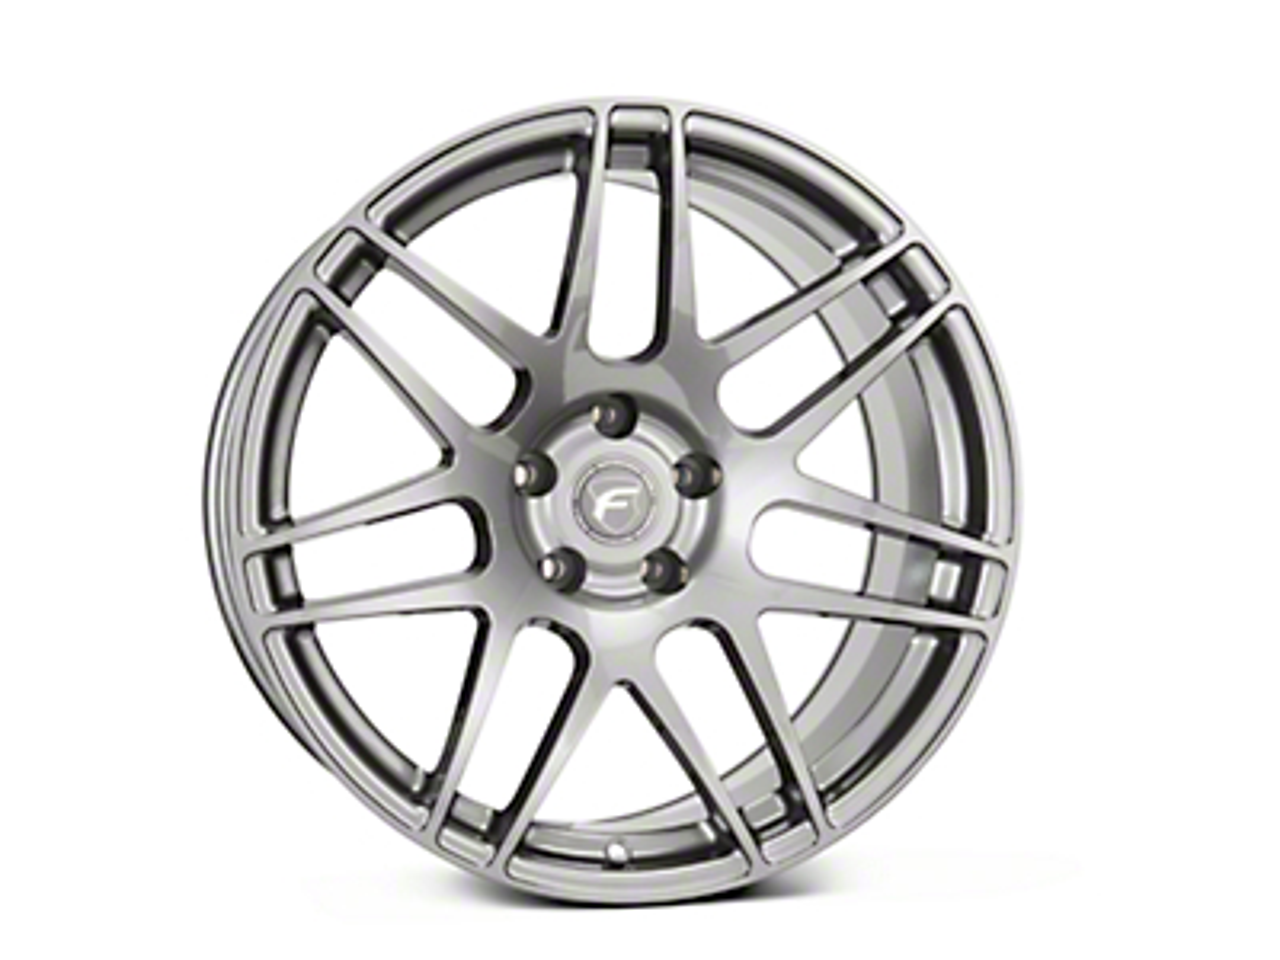 Forgestar F14 Monoblock Gunmetal Wheel - 19x11 (15-18 GT, GT350)